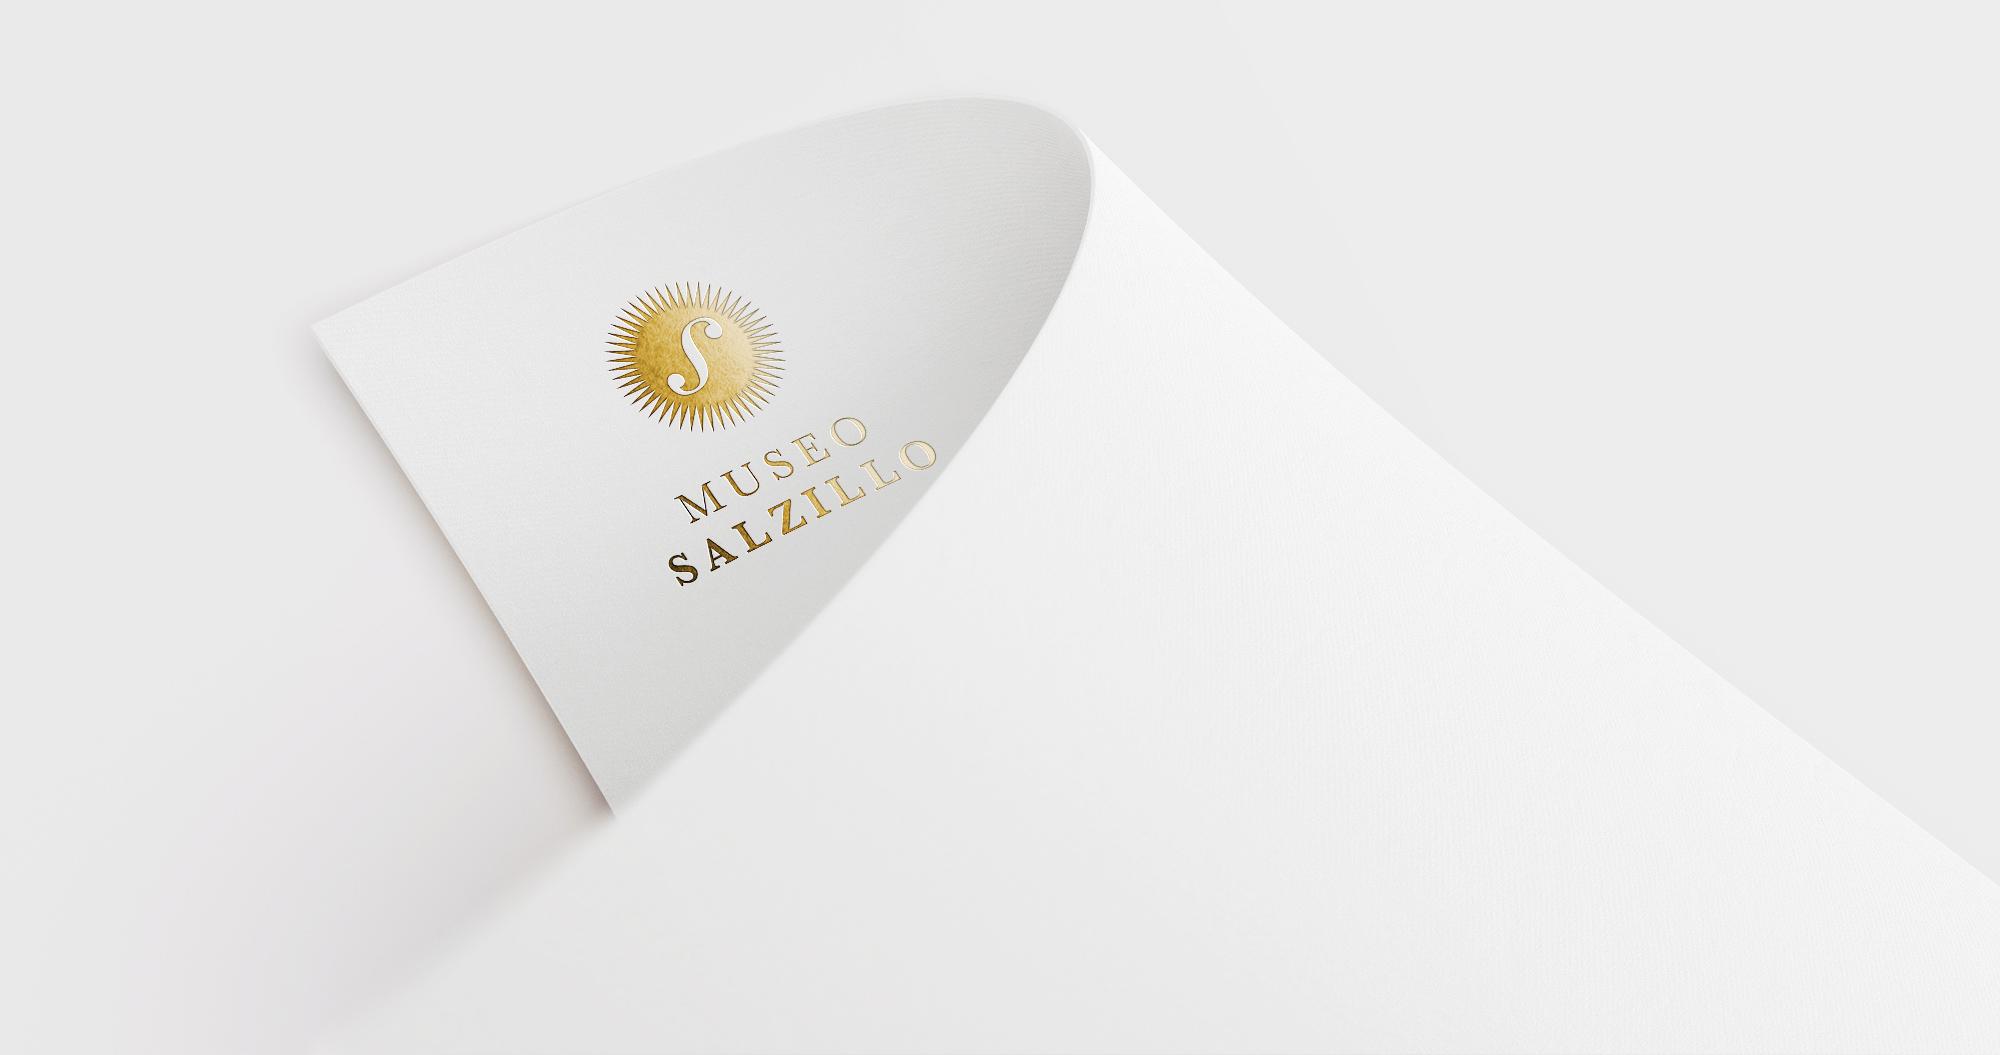 Museo-salzillo-branding-03